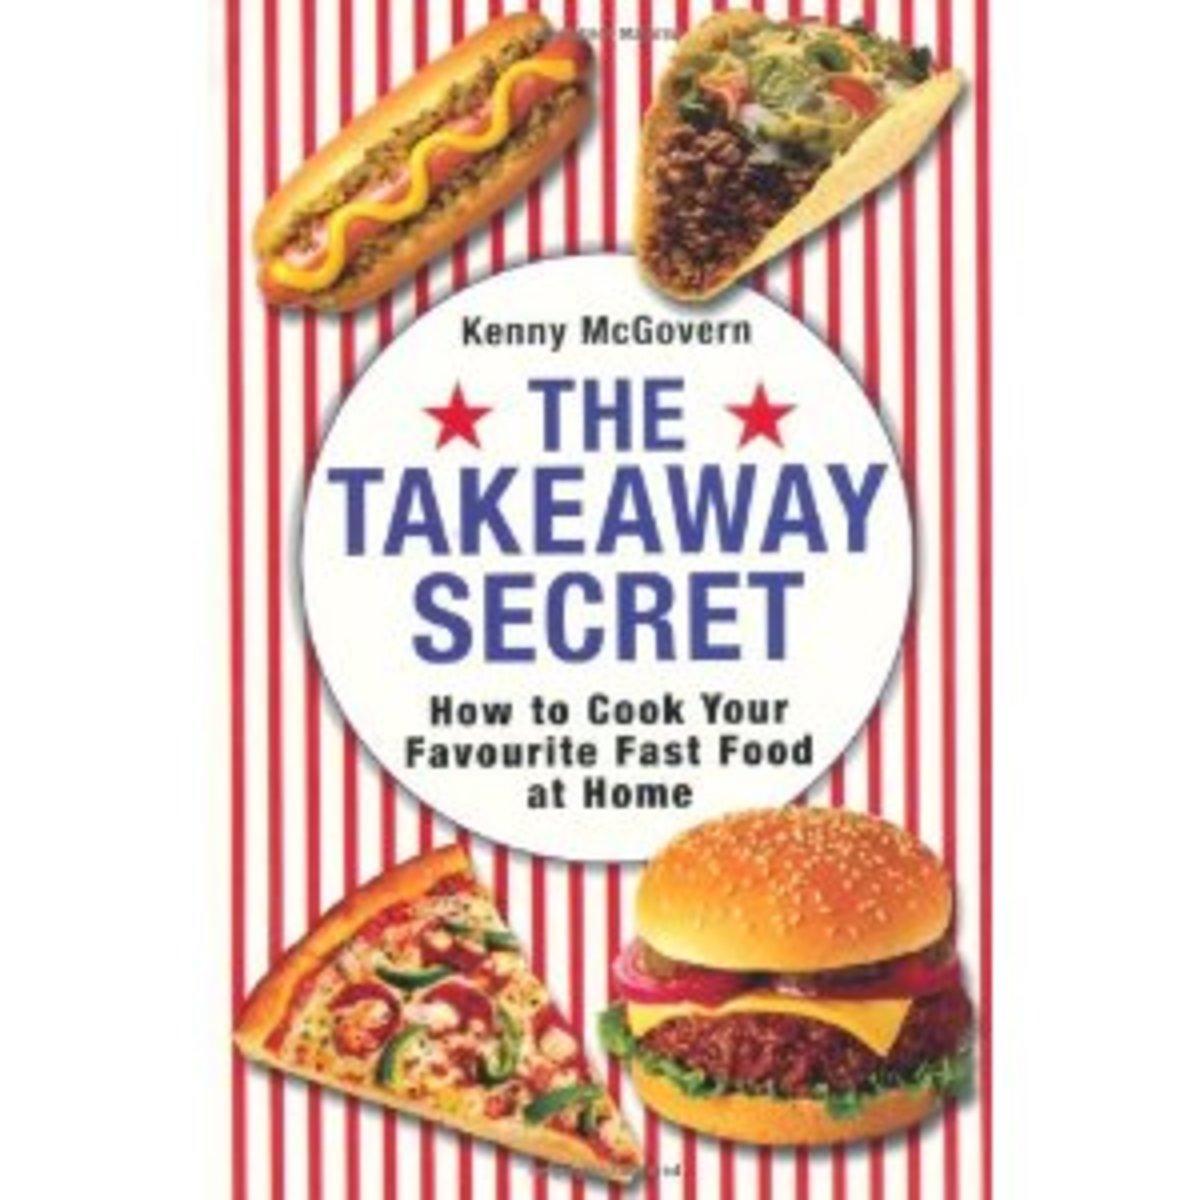 The Takeaway Secret Recipes